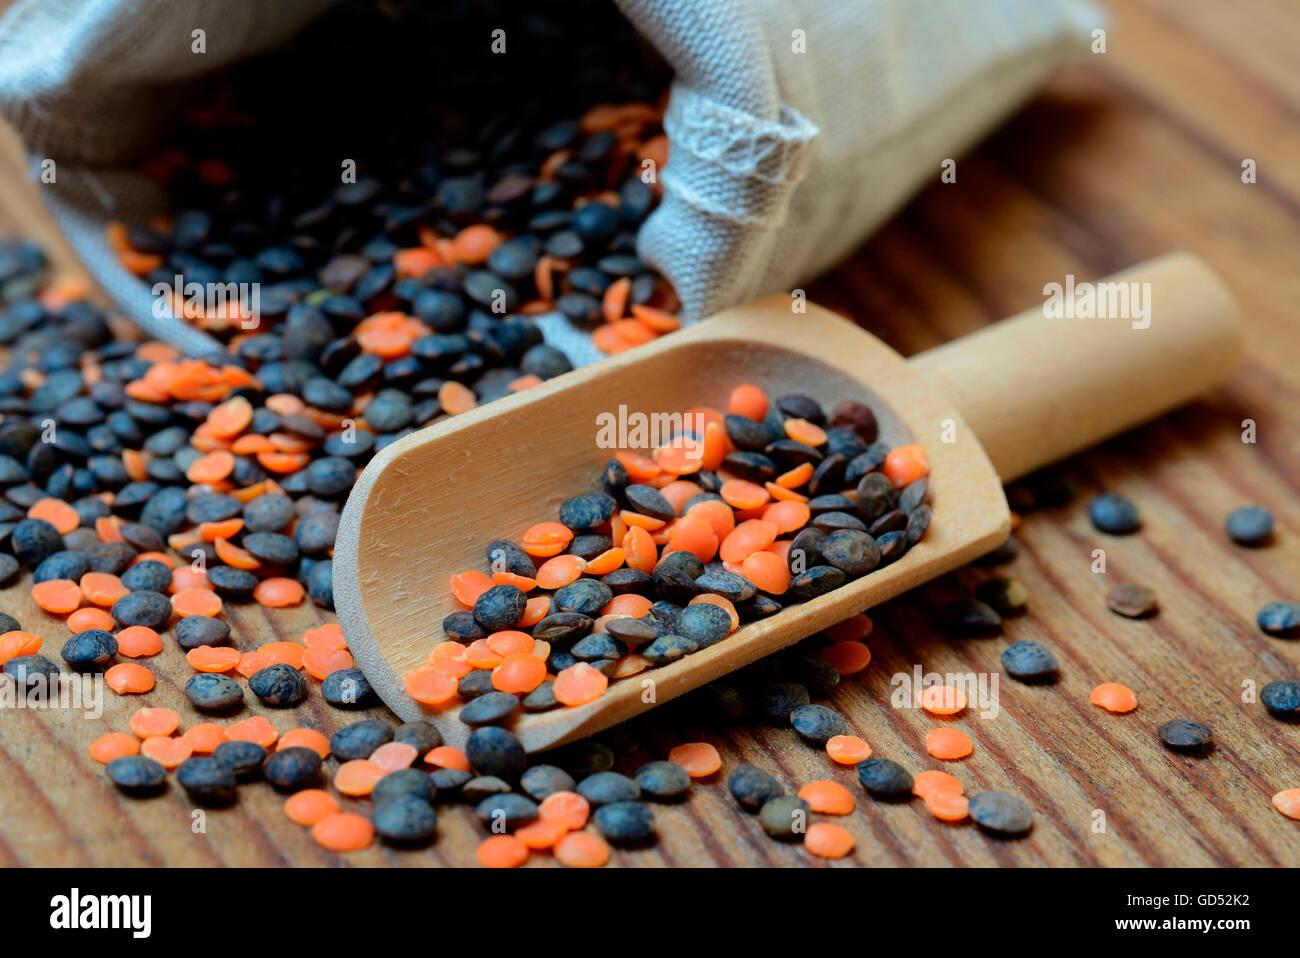 Rote und grüne Lentlis / (Lens Culinaris) Stockbild